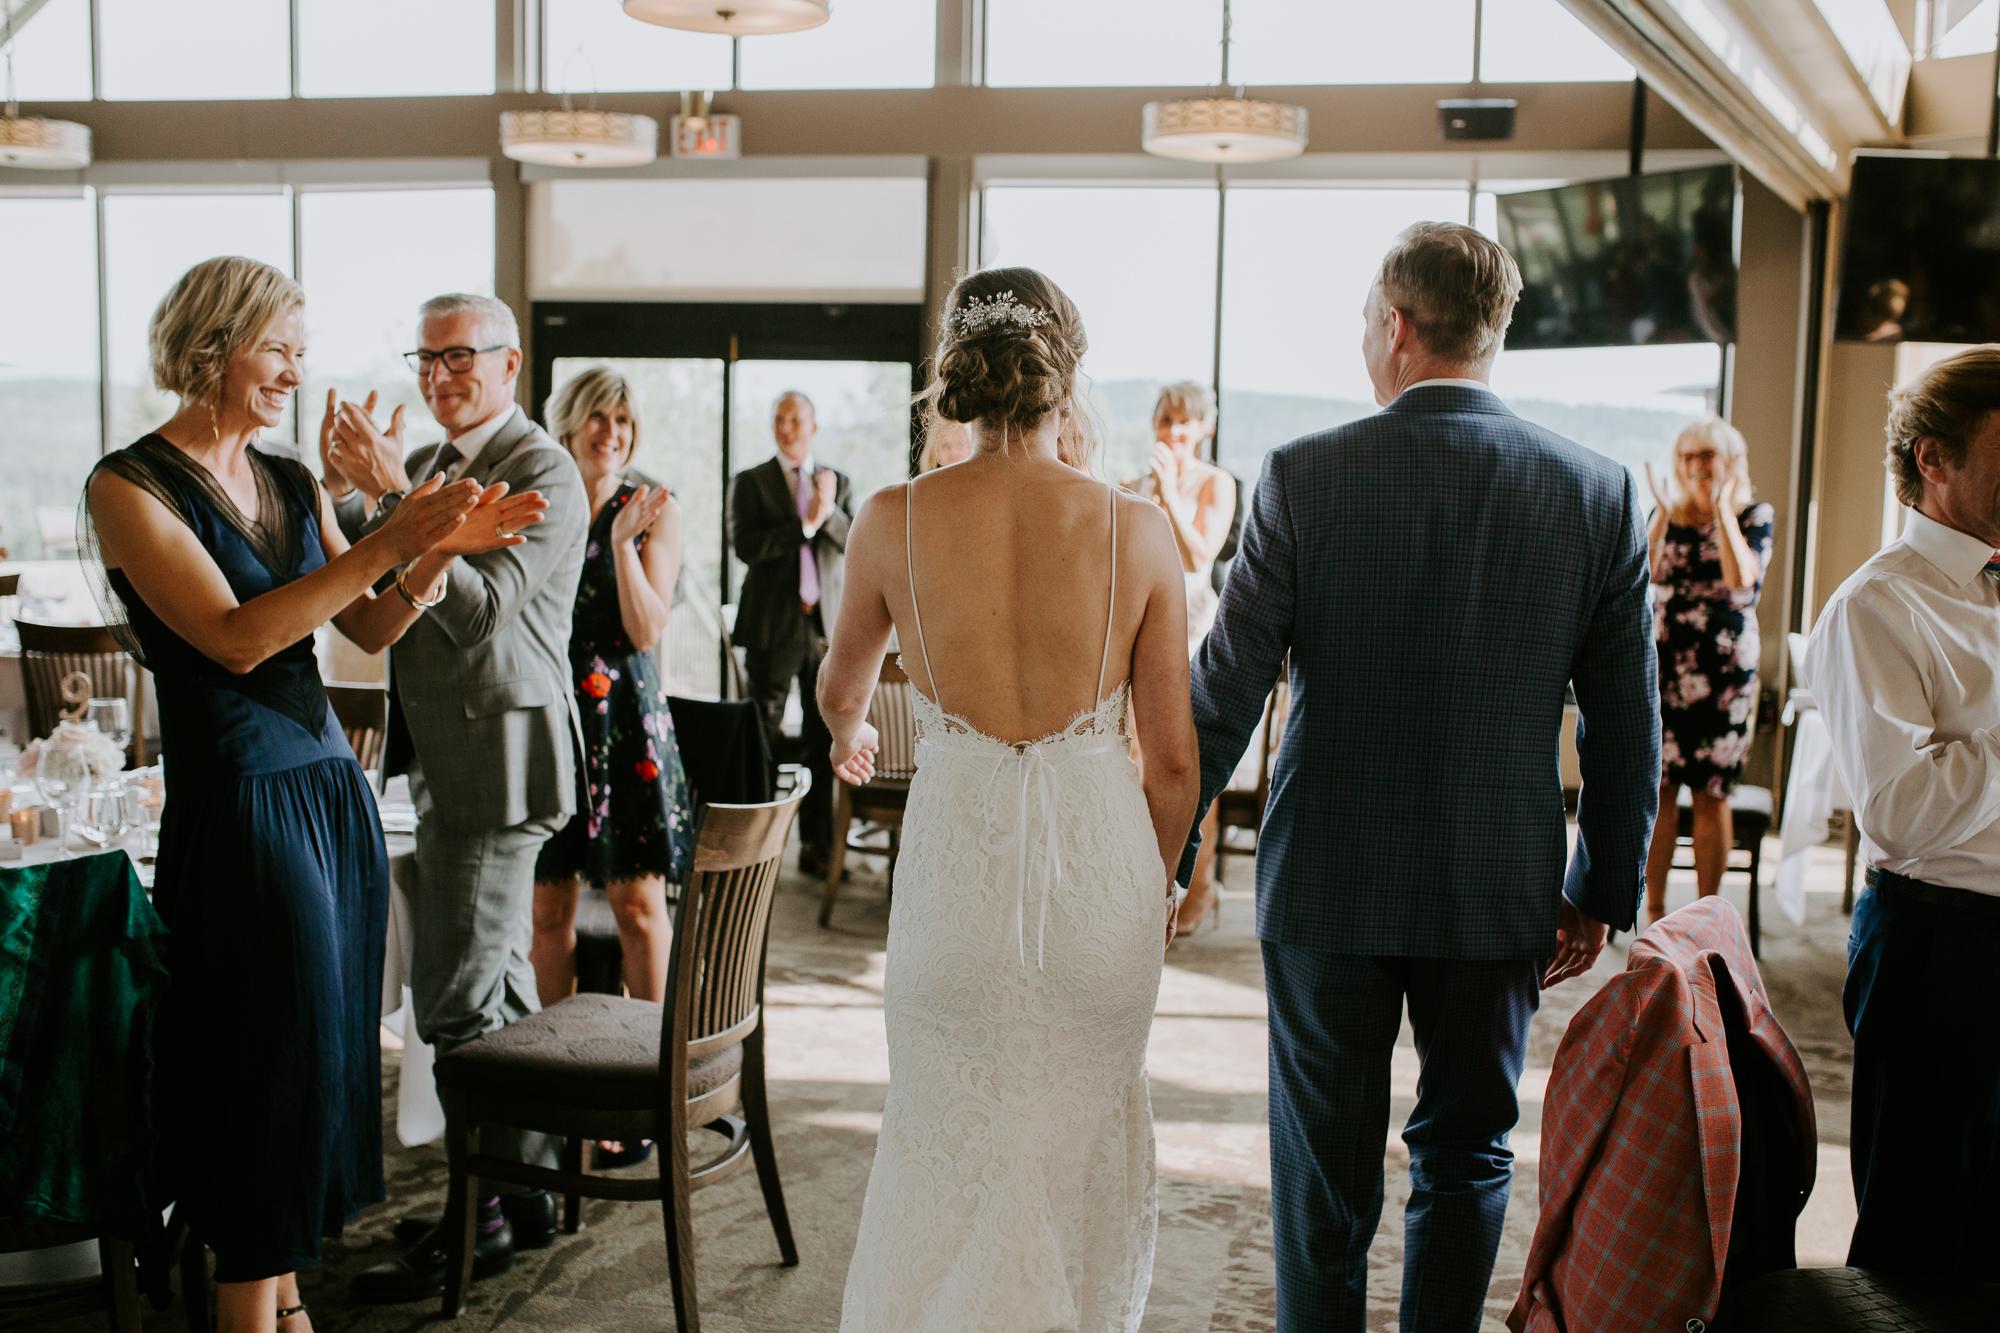 Priddis-Wedding-Photographer-JG-50.jpg